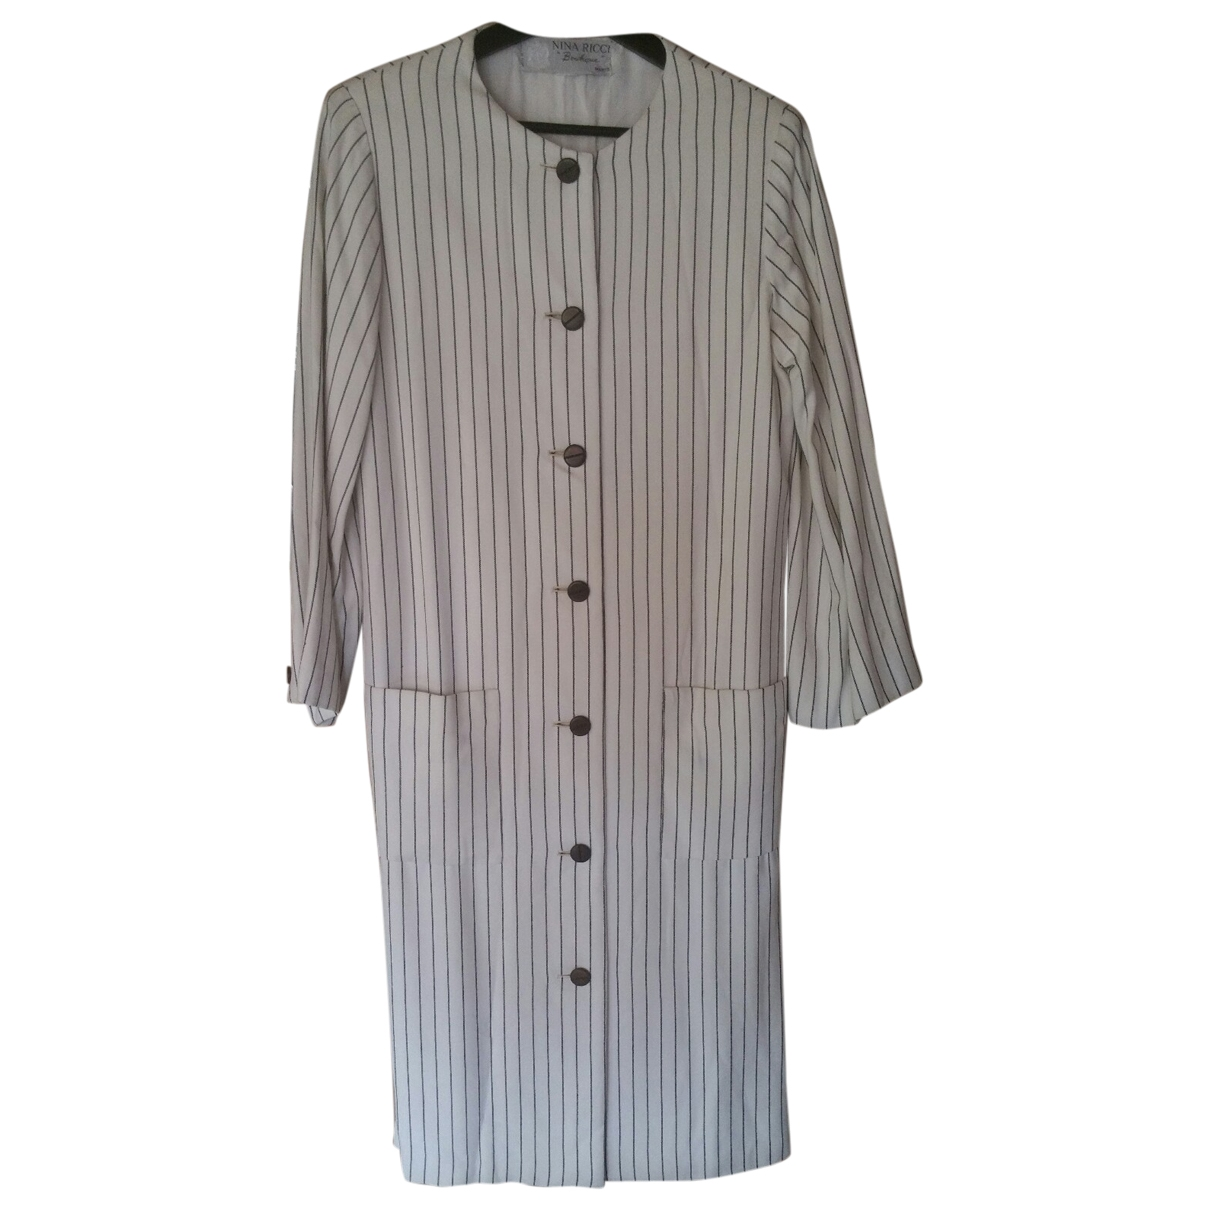 Nina Ricci \N White Cotton dress for Women M International